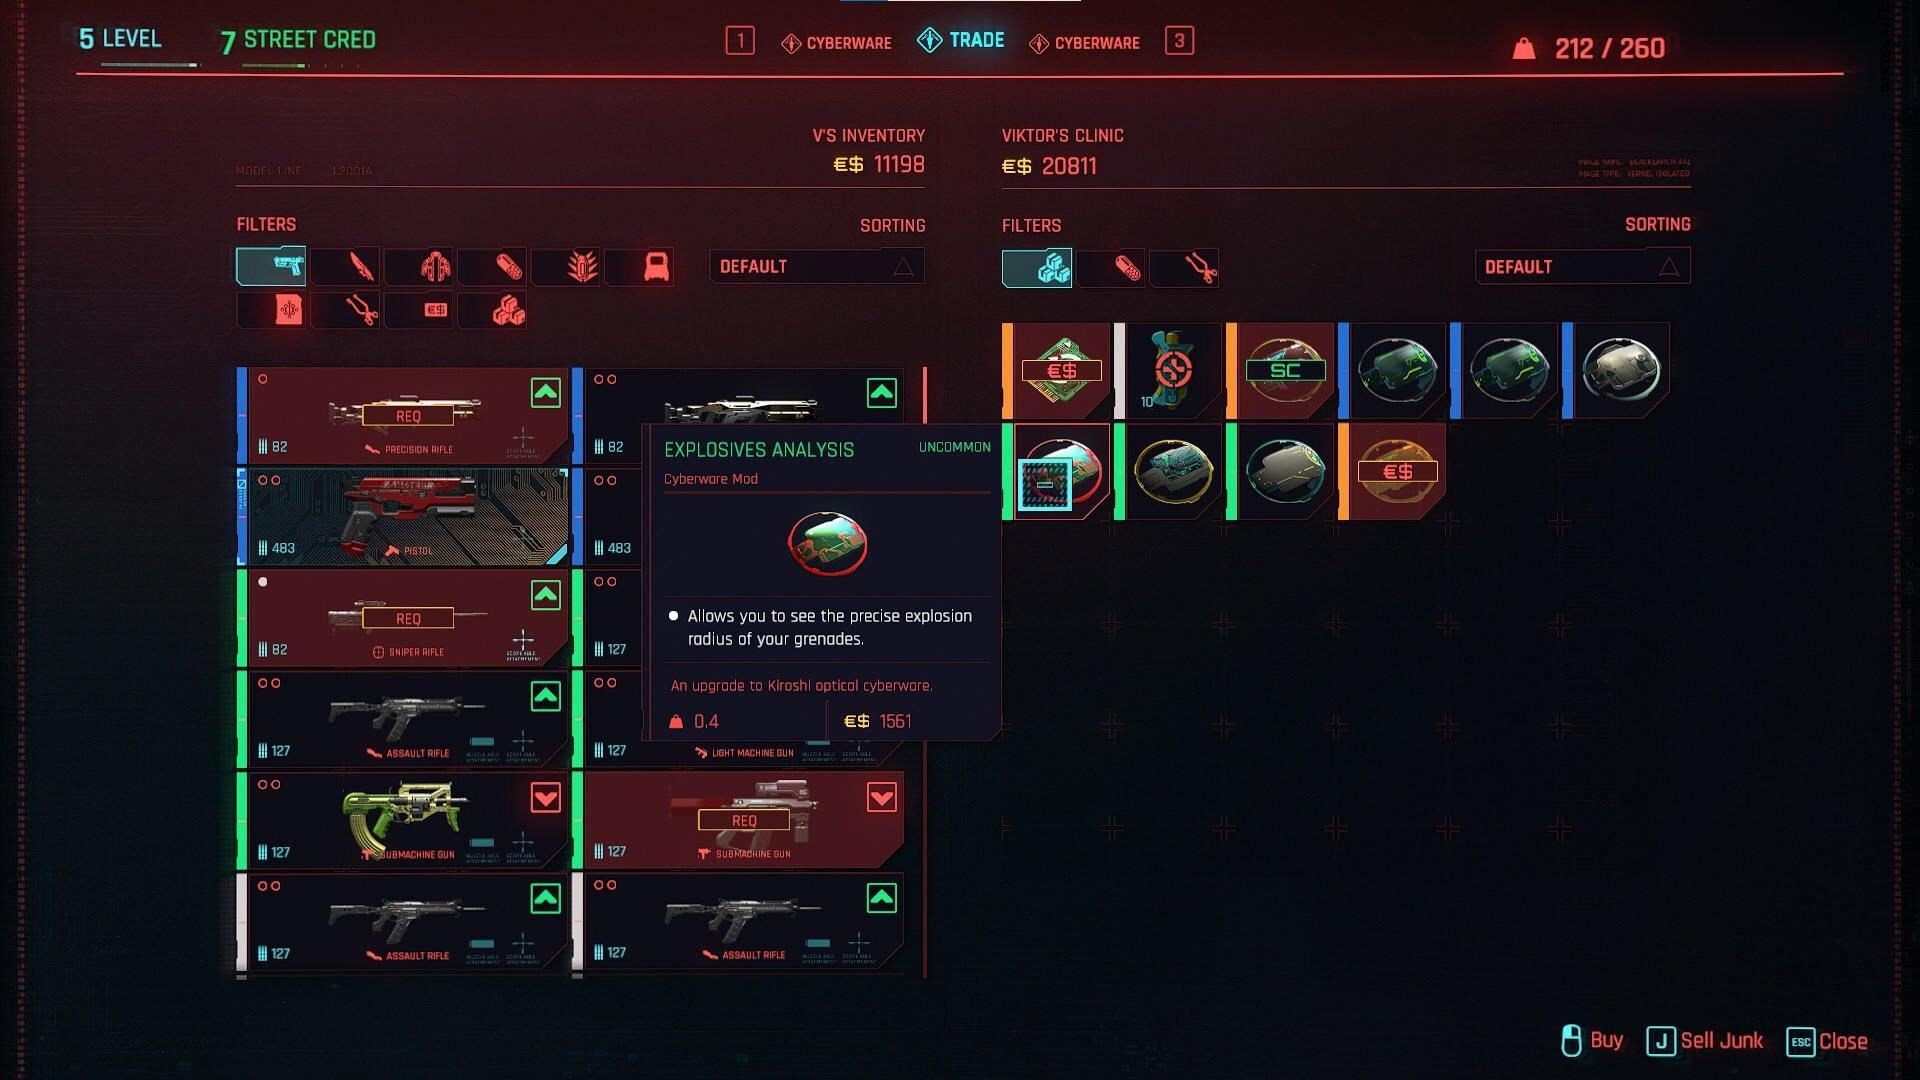 Cyberpunk 2077 Cyberware Guide Cyberware Mod Overview In Sales Menu of Ripperdoc Viktor